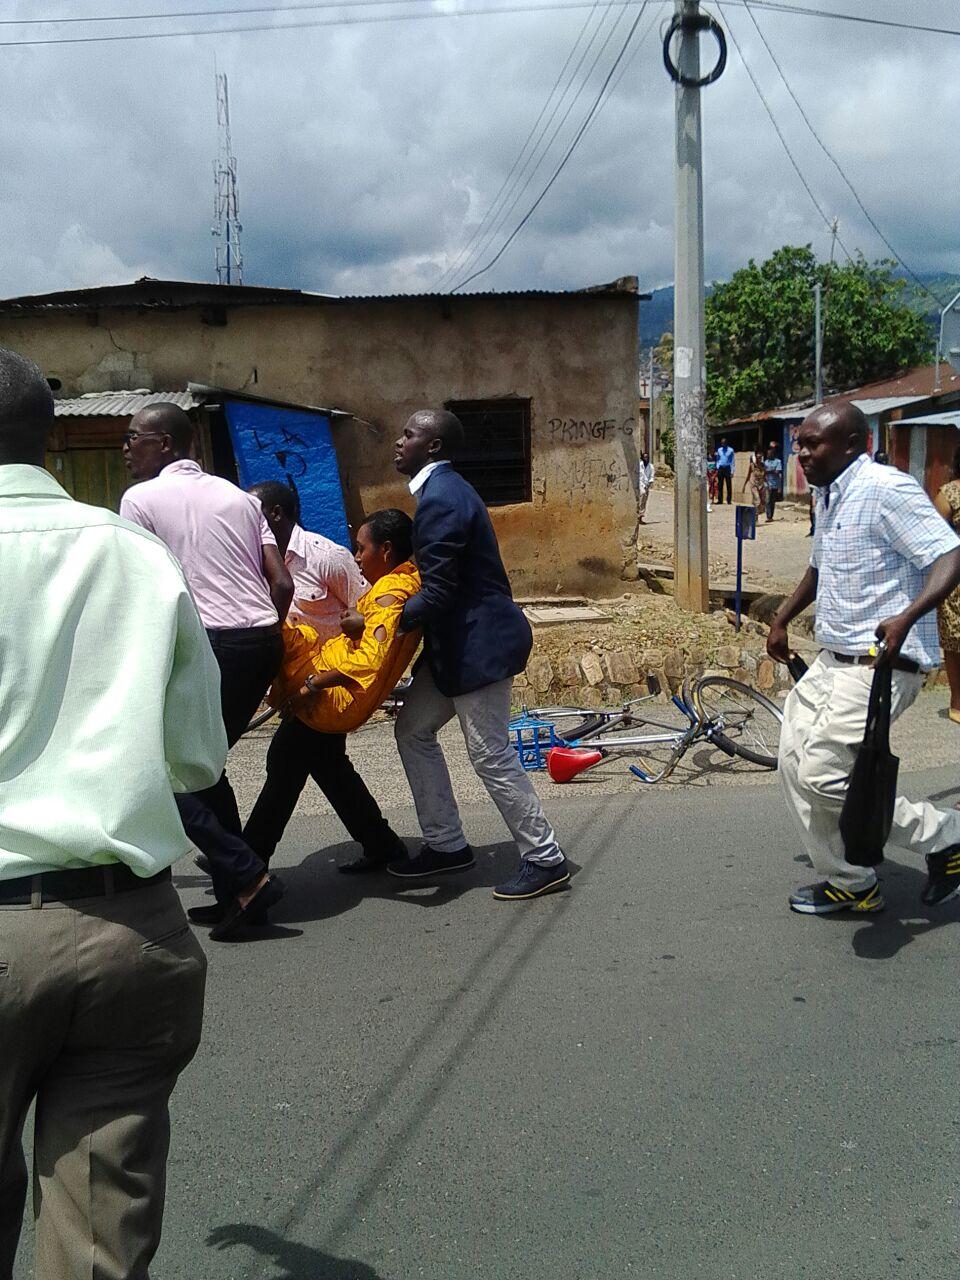 L'épouse du ministre Nivyabandi évacuée